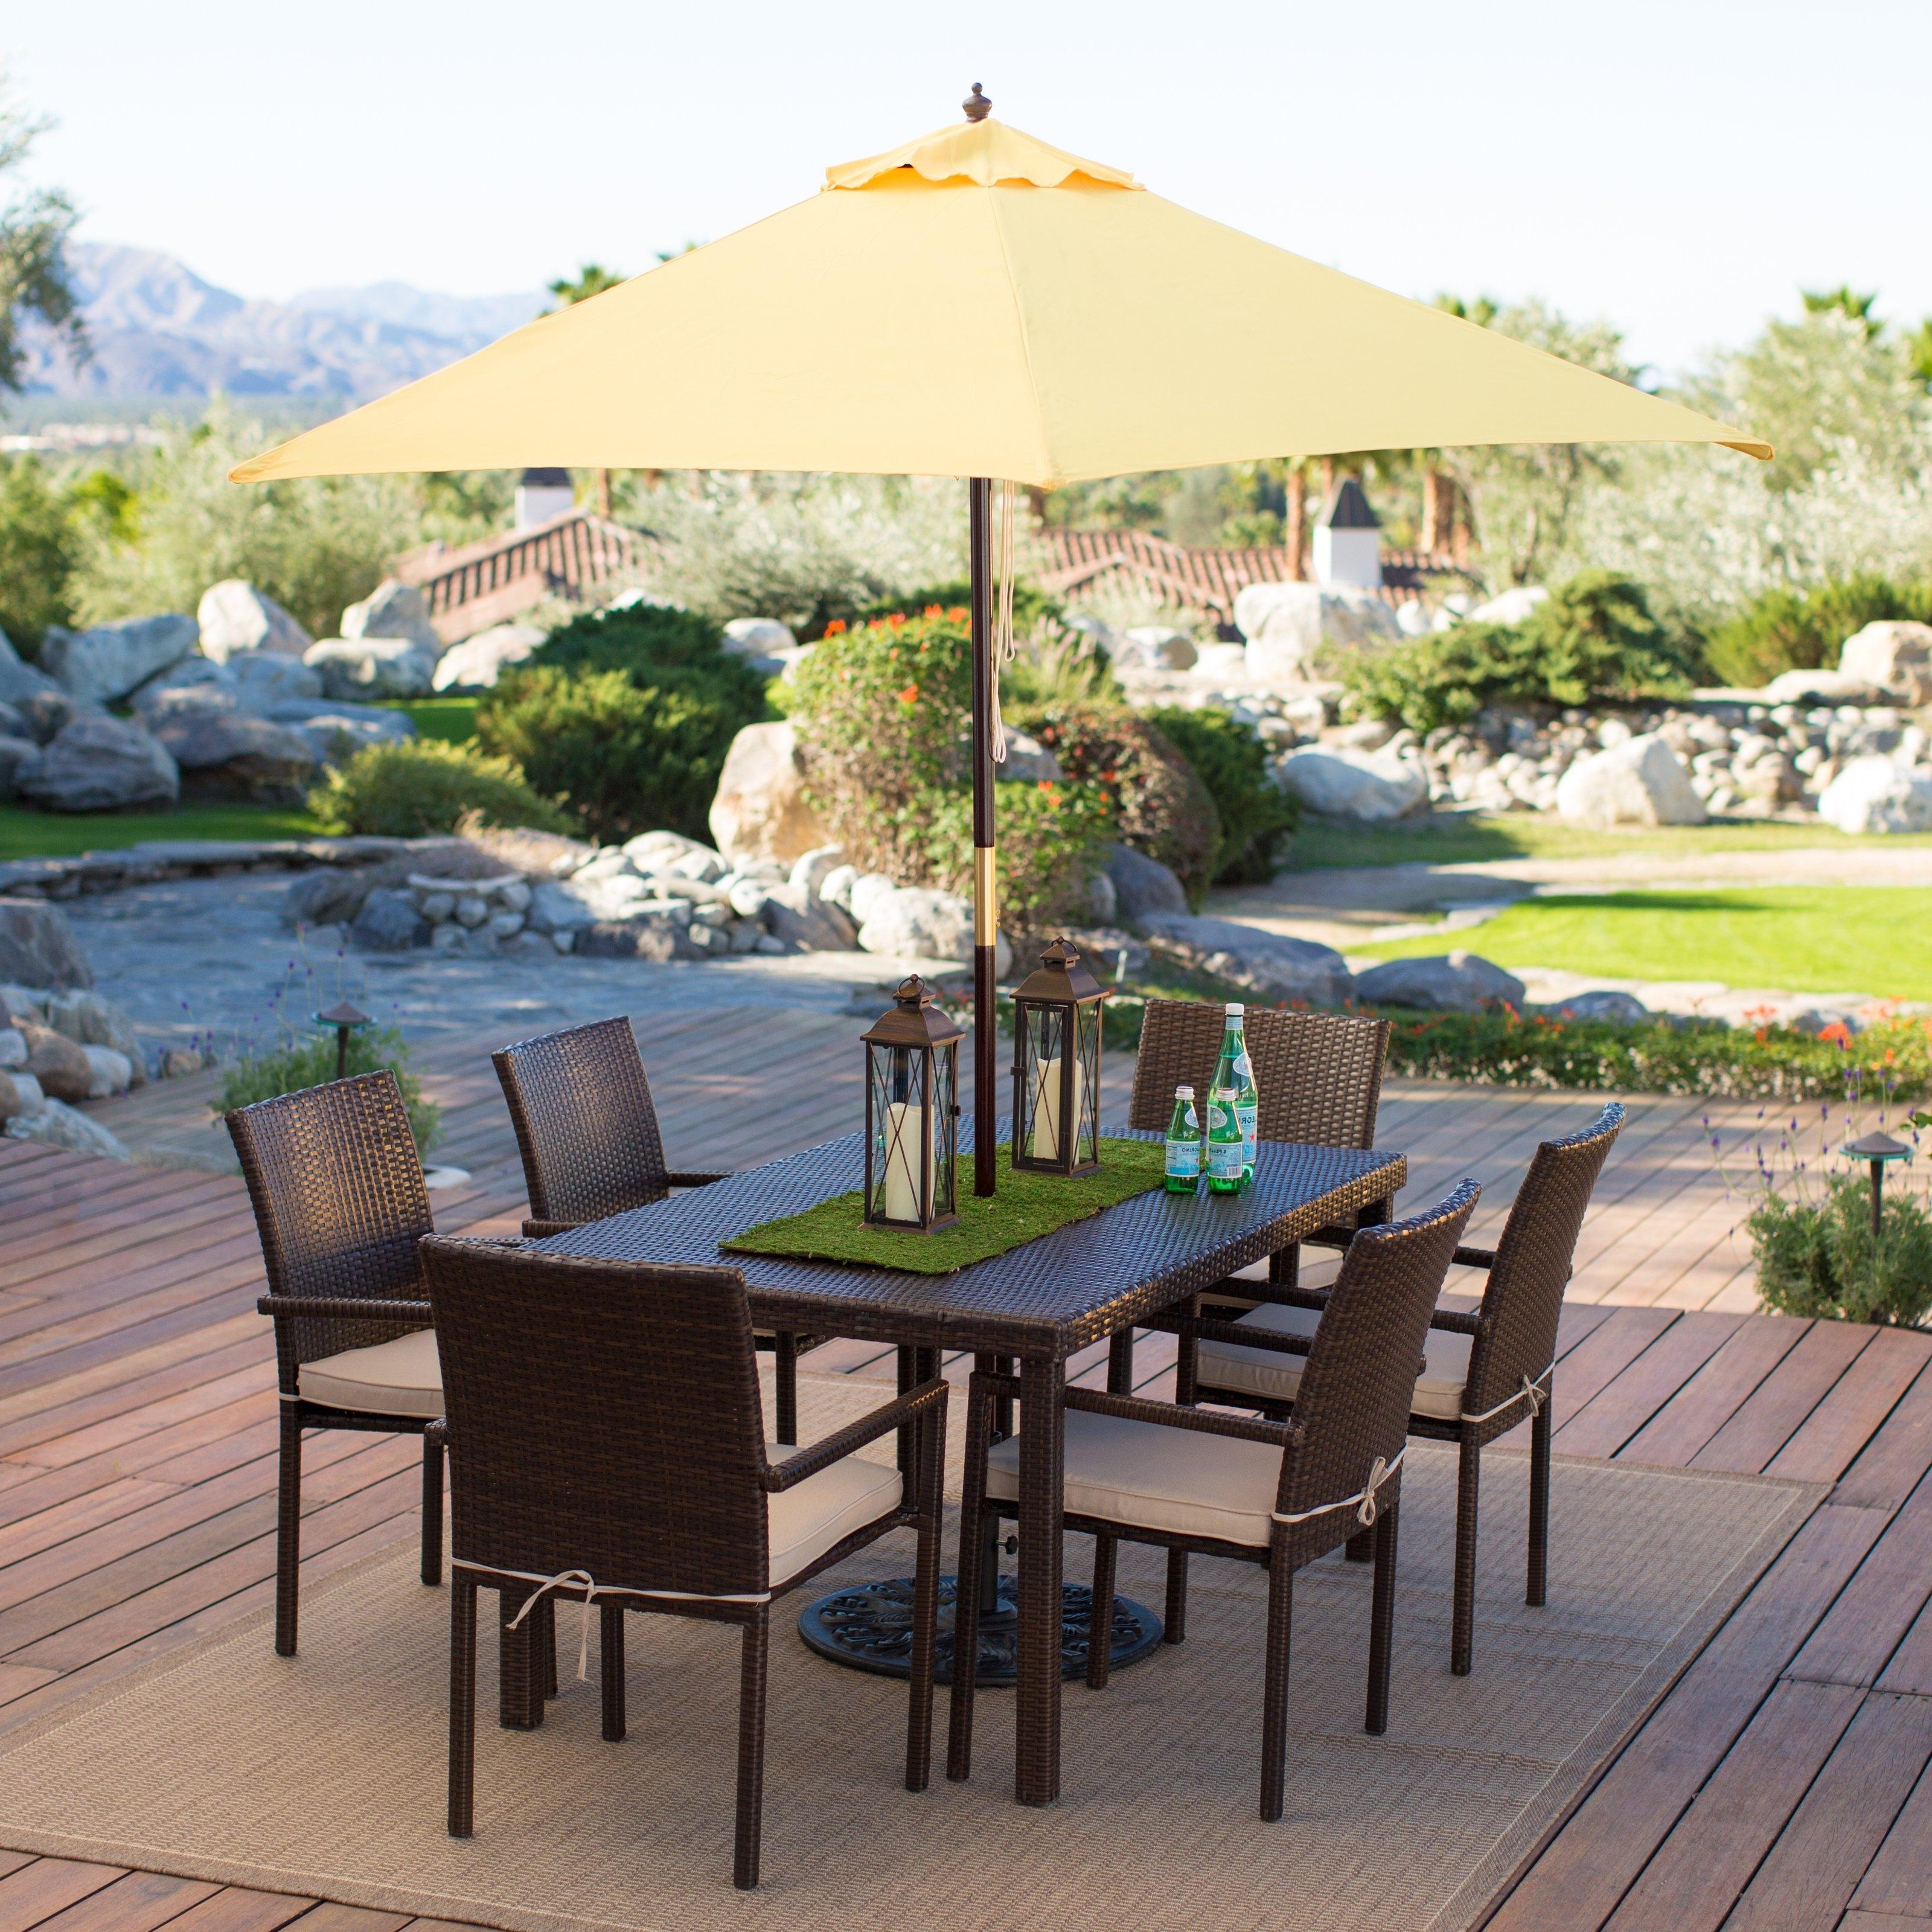 Most Recent Giant Patio Umbrellas Within Garden: Enchanting Outdoor Patio Decor Ideas With Patio Umbrellas (View 18 of 20)